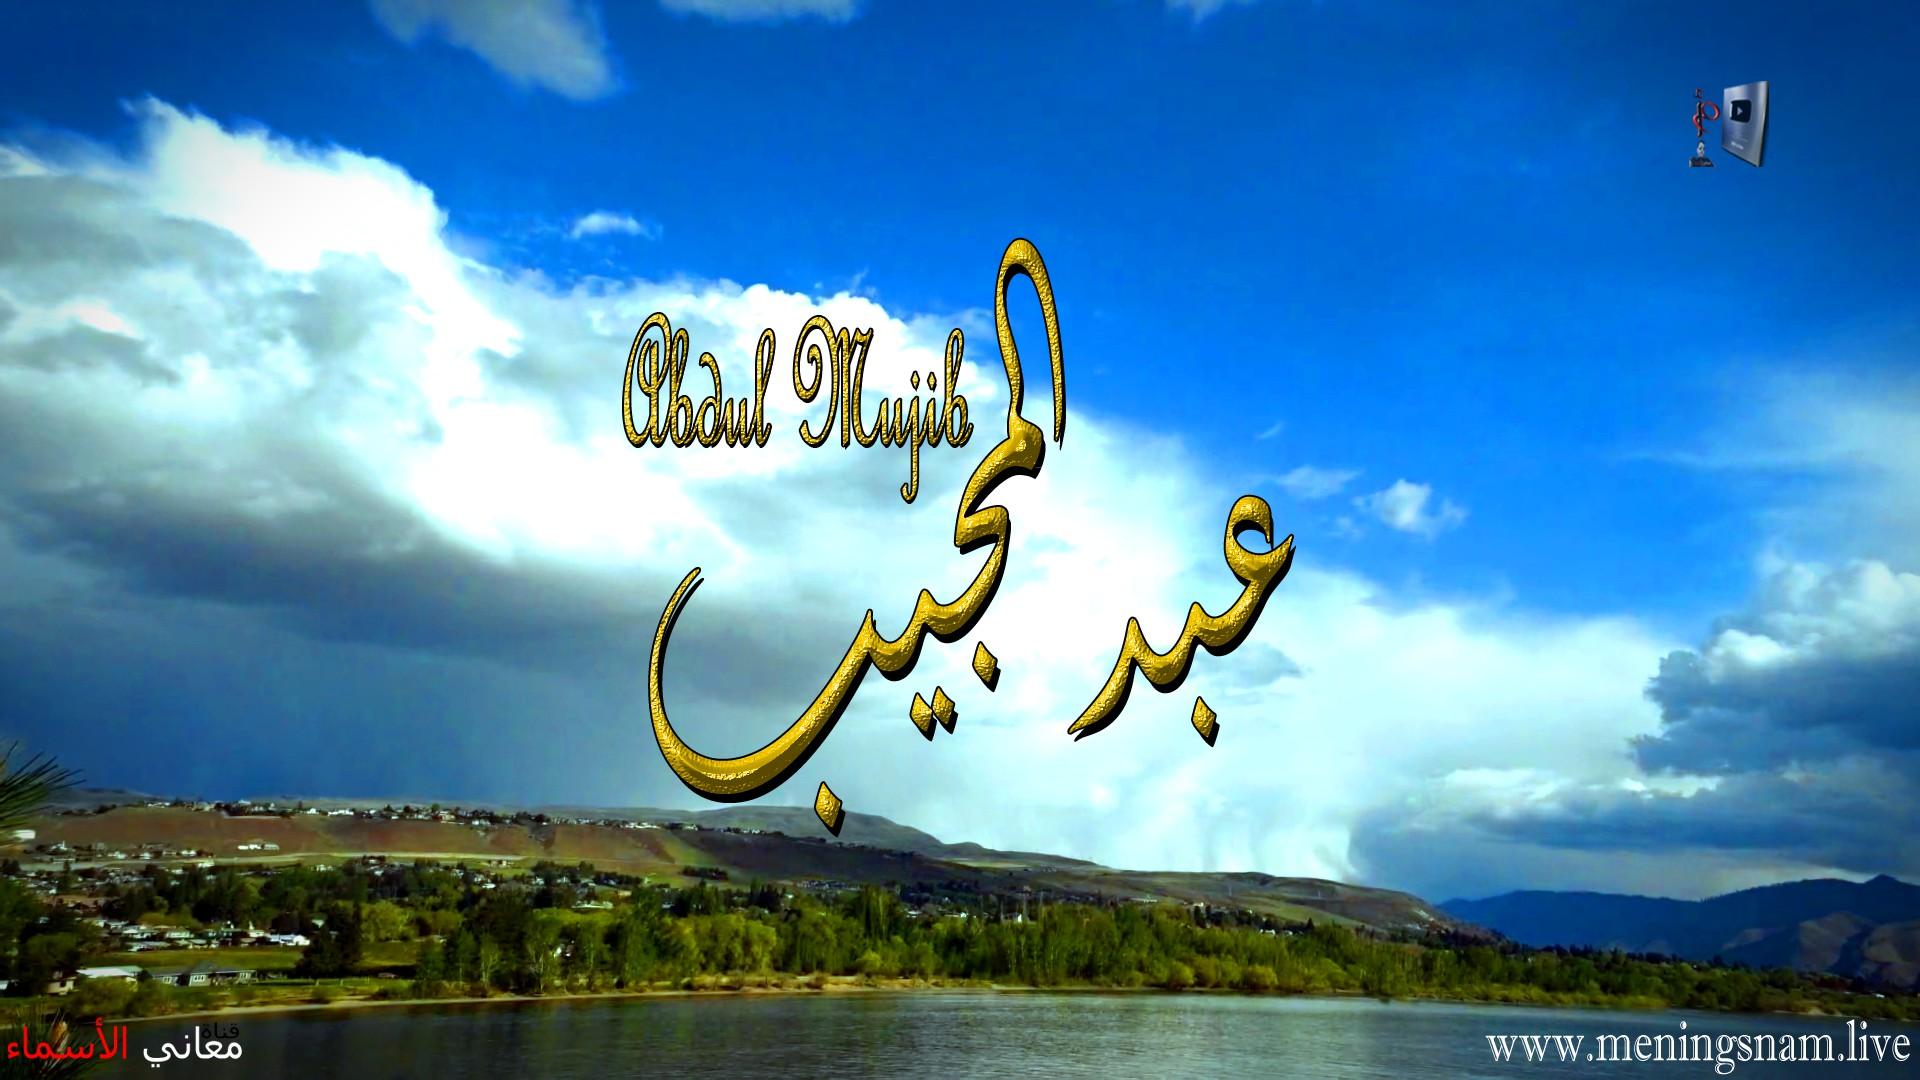 معنى اسم عبد المجيب, وصفات حامل هذا الاسم, Abdul Mojib, mujib year,mujibur rahman,mujib pardeshi gaan,mujib,mujib mashal,mujib ur rehman